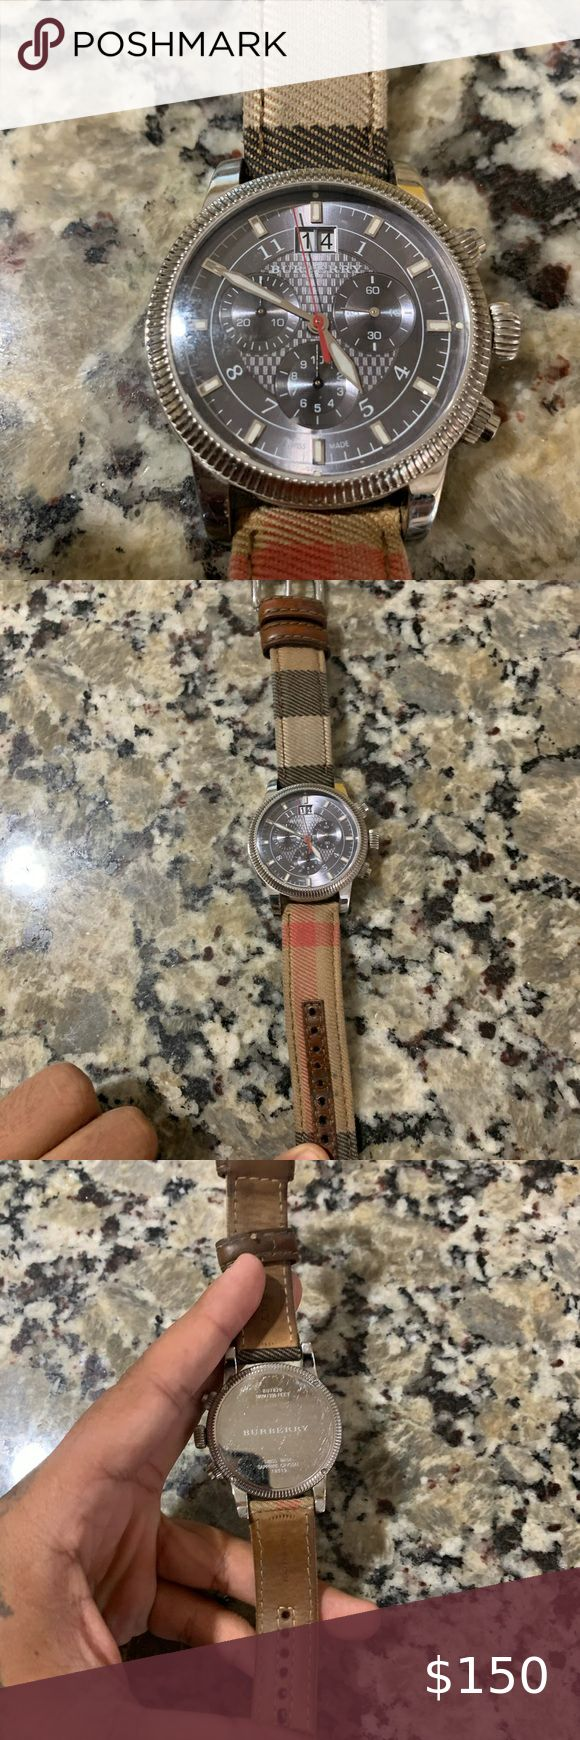 Mens Burberry Watch Quartz Mvmt in 2020 Burberry watch